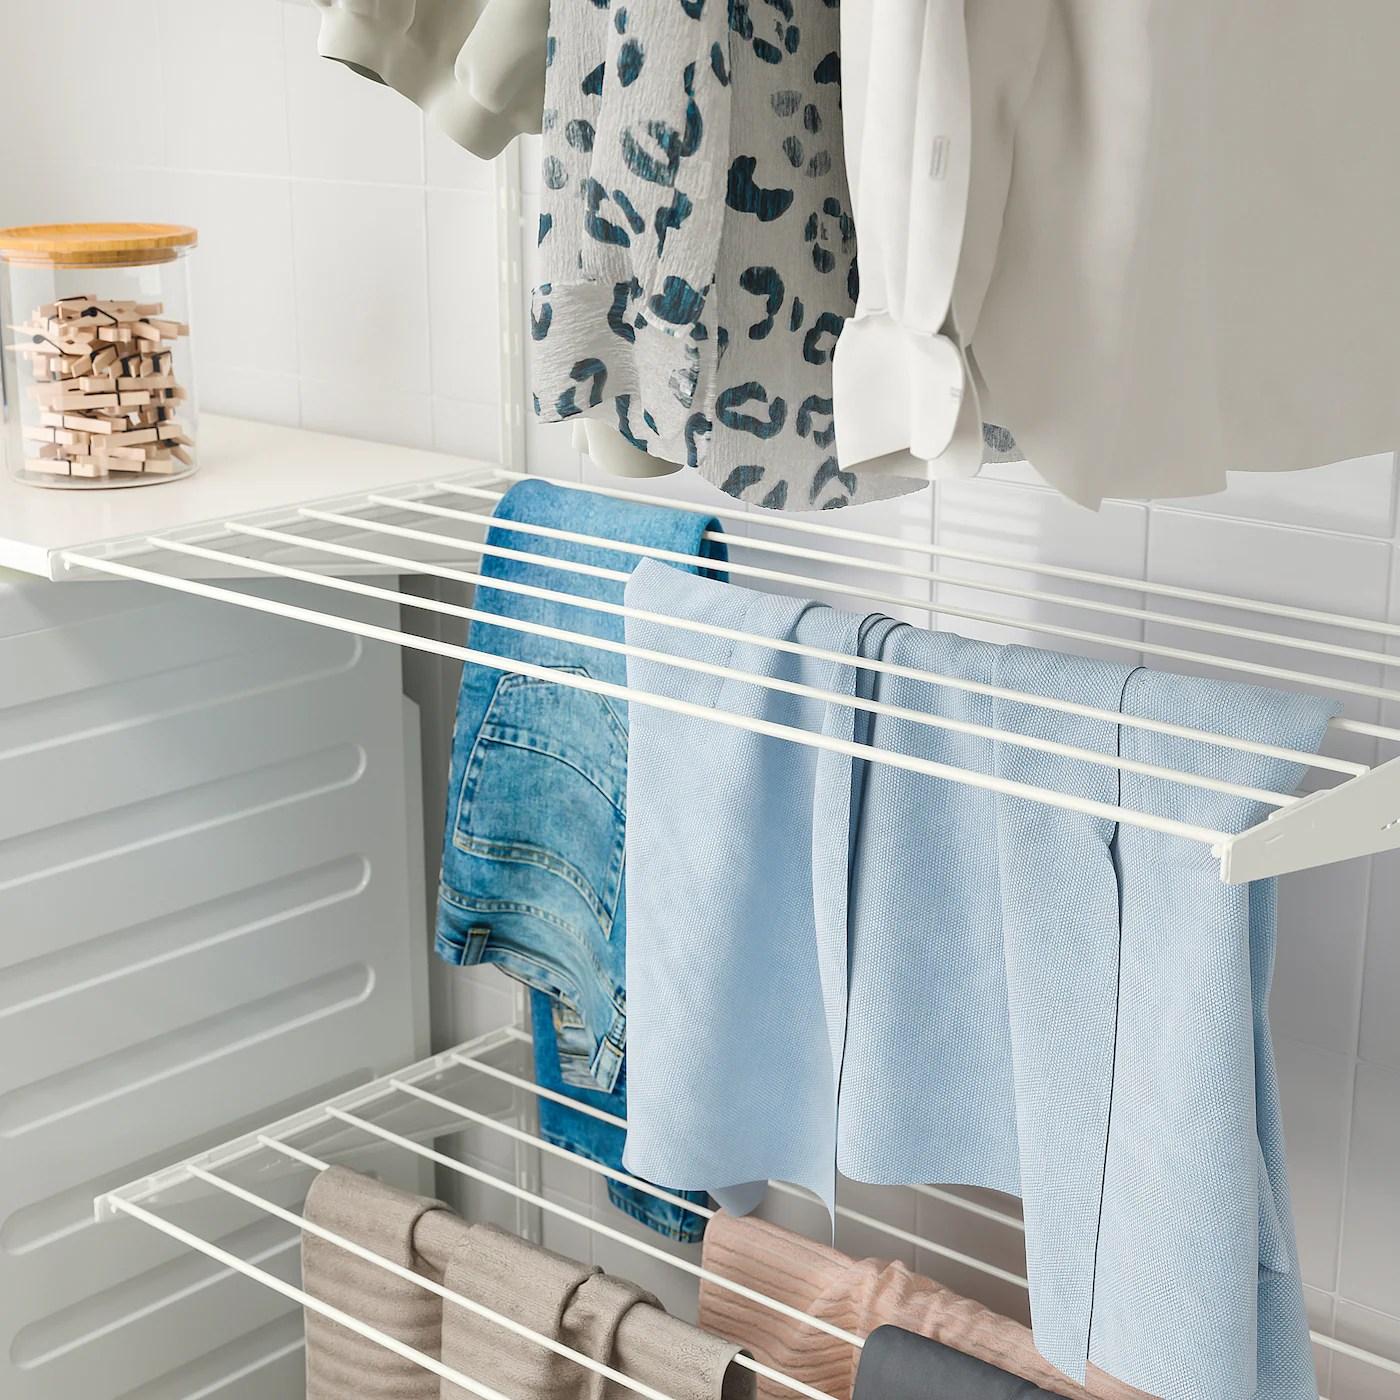 boaxel drying rack white 80x40 cm